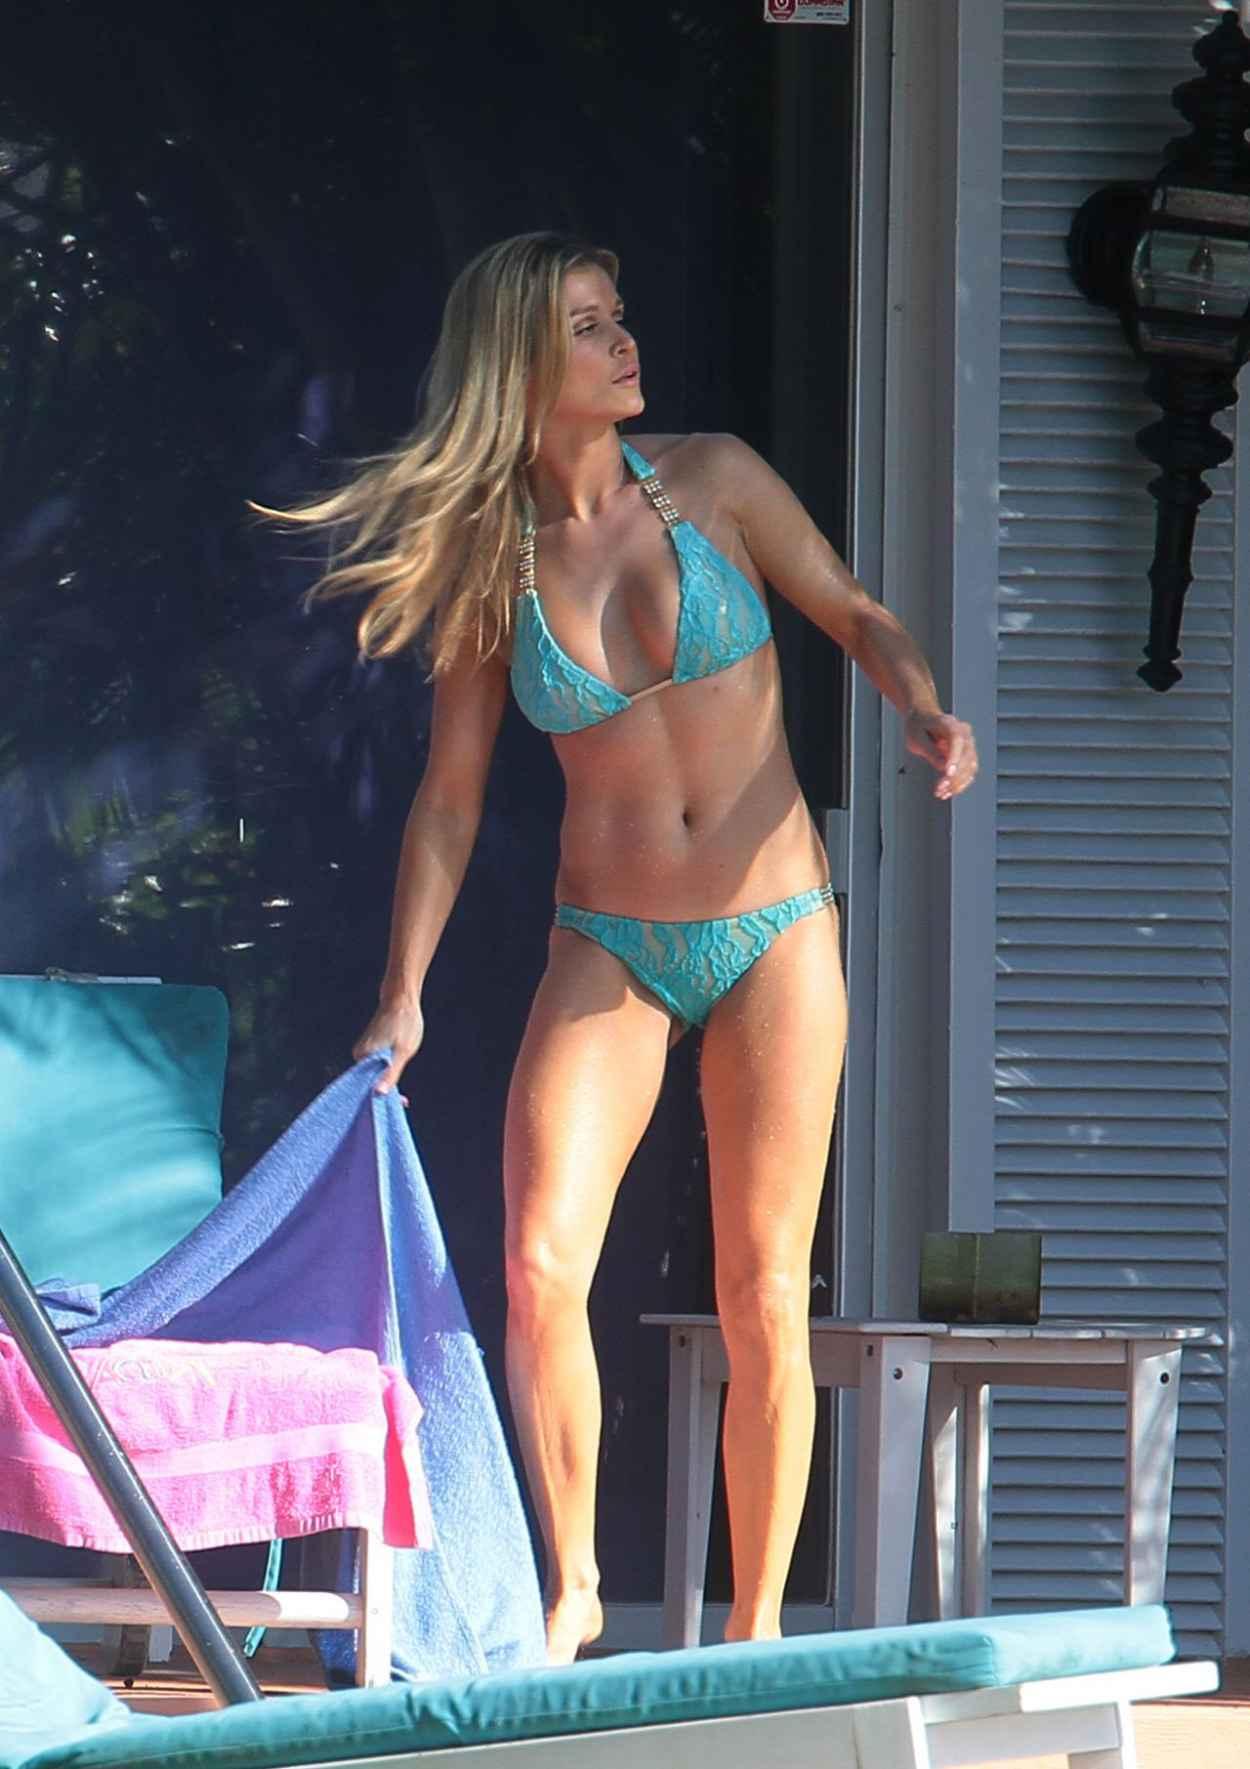 Joanna Krupa Hot in Bikini - Poolside, Miami February 2015-1